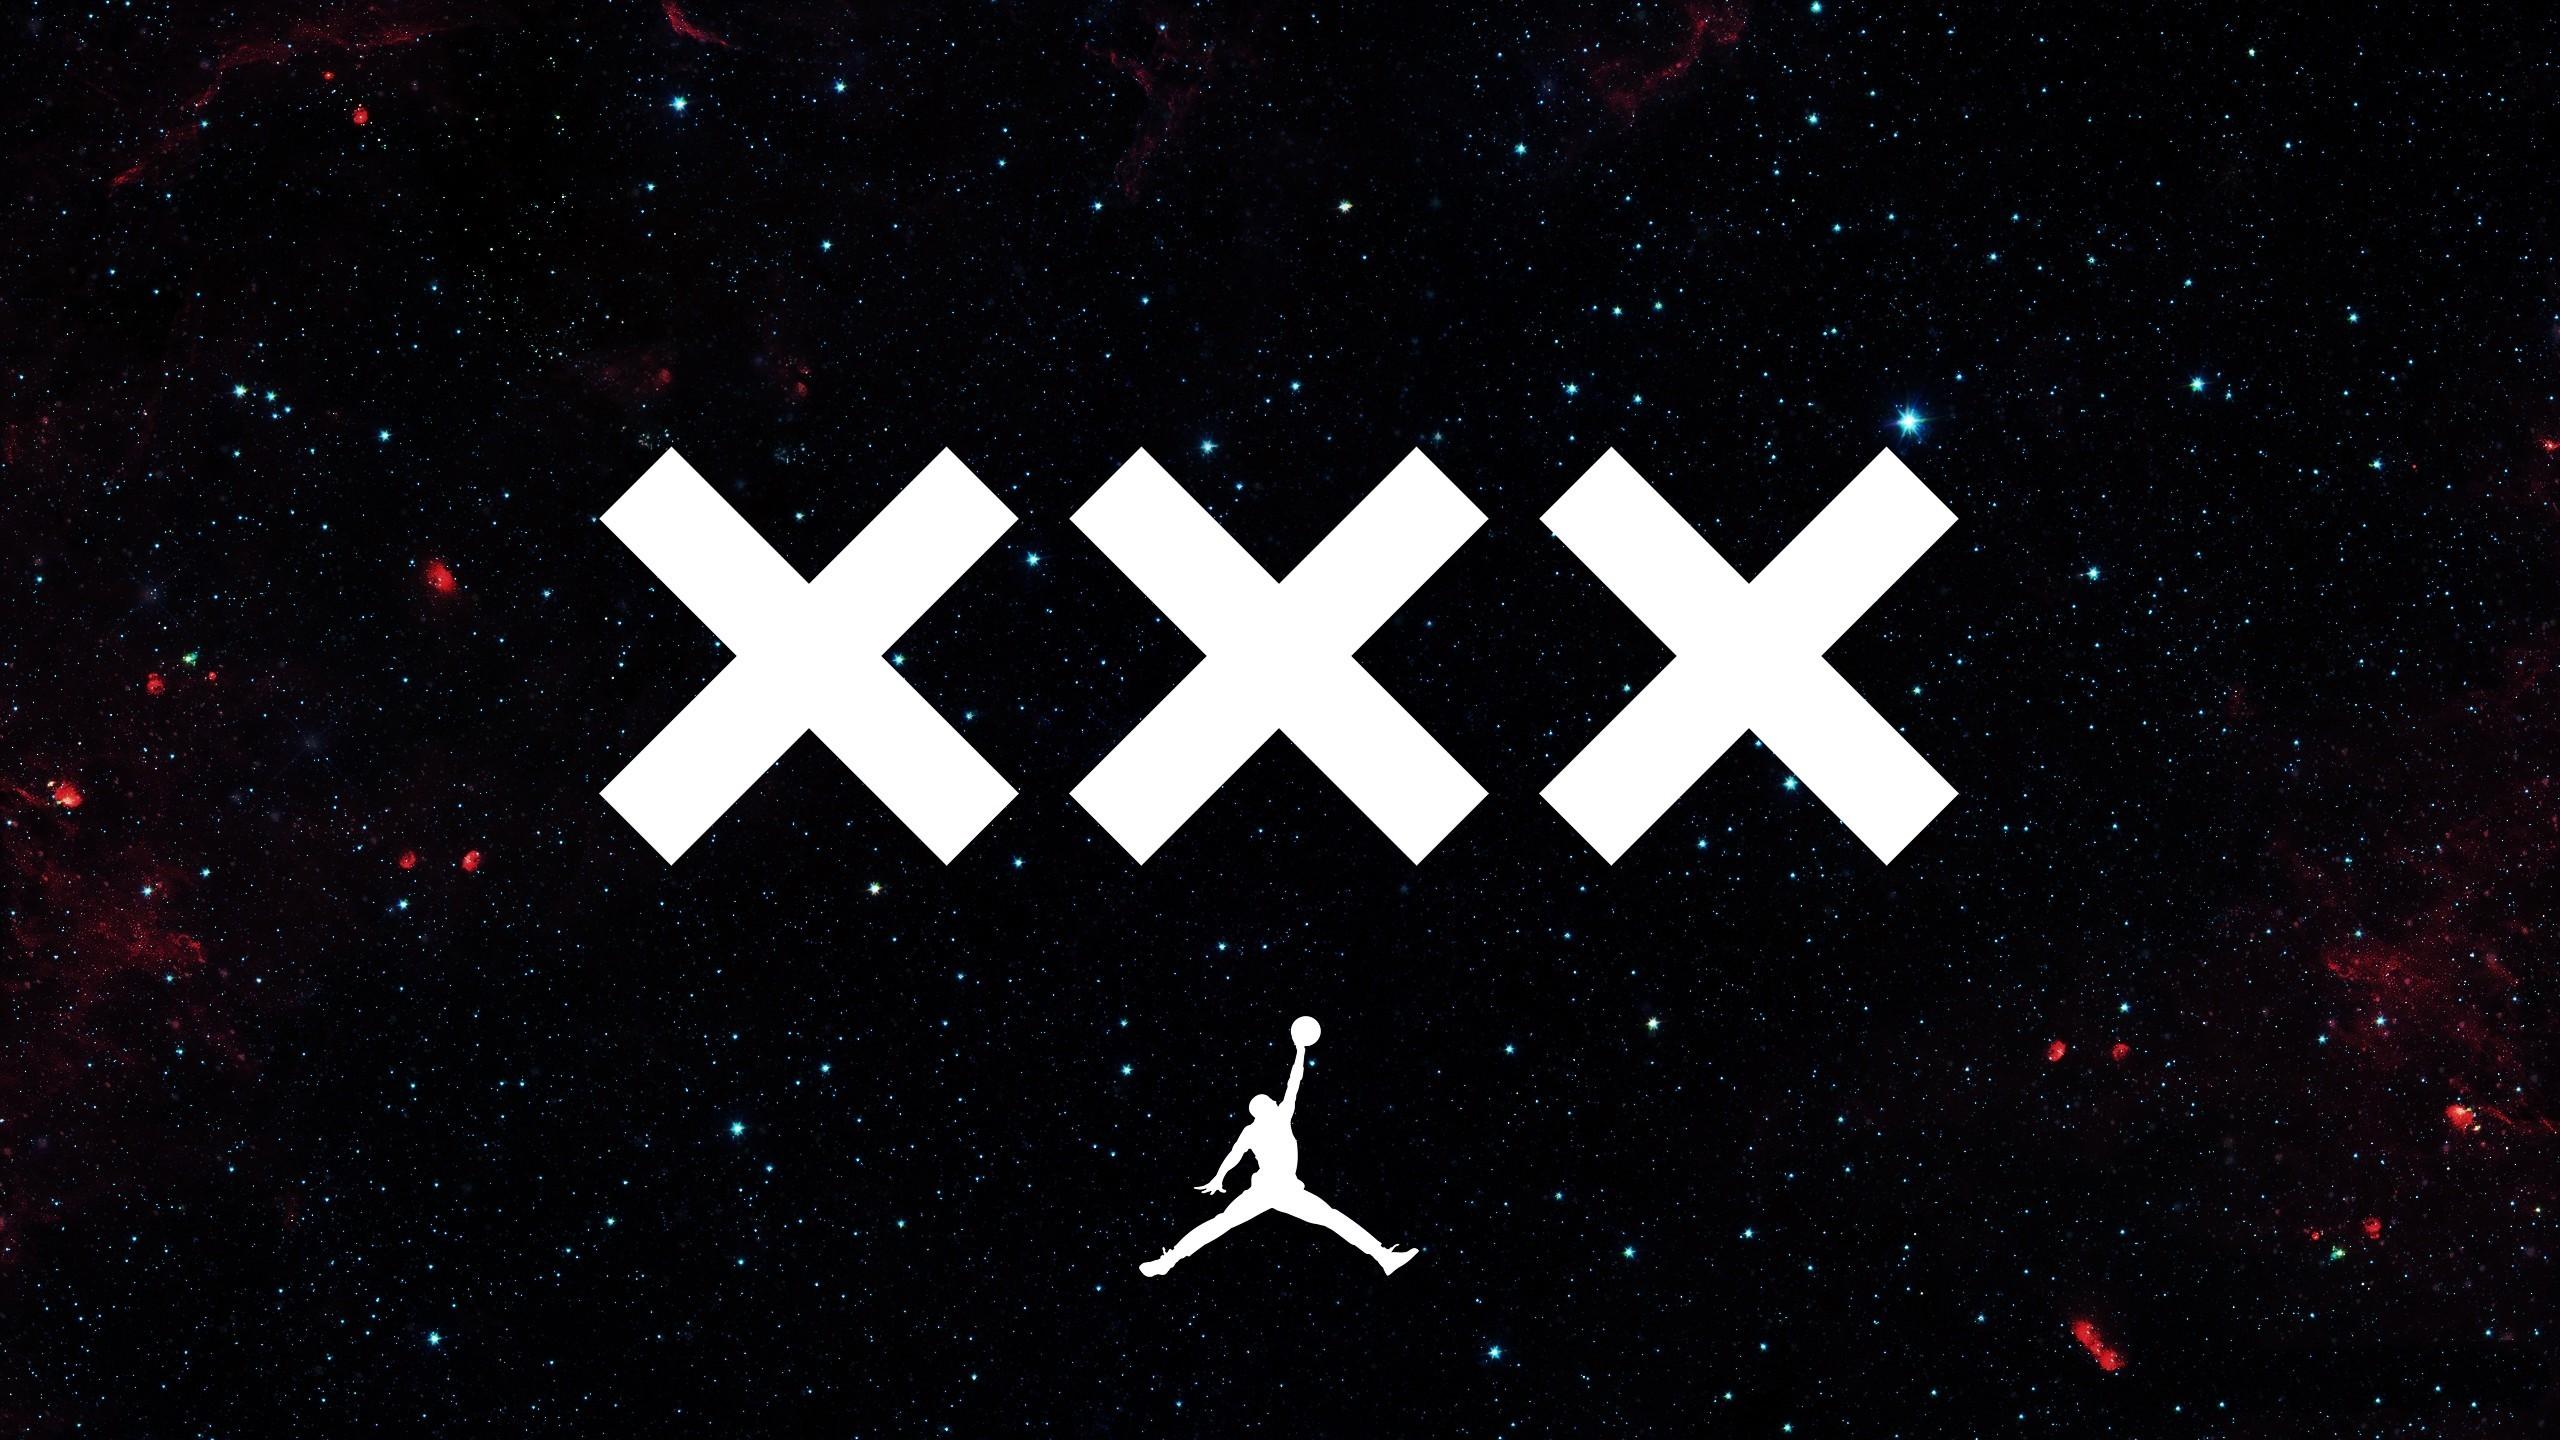 Download Photos Of Jordan Shoes